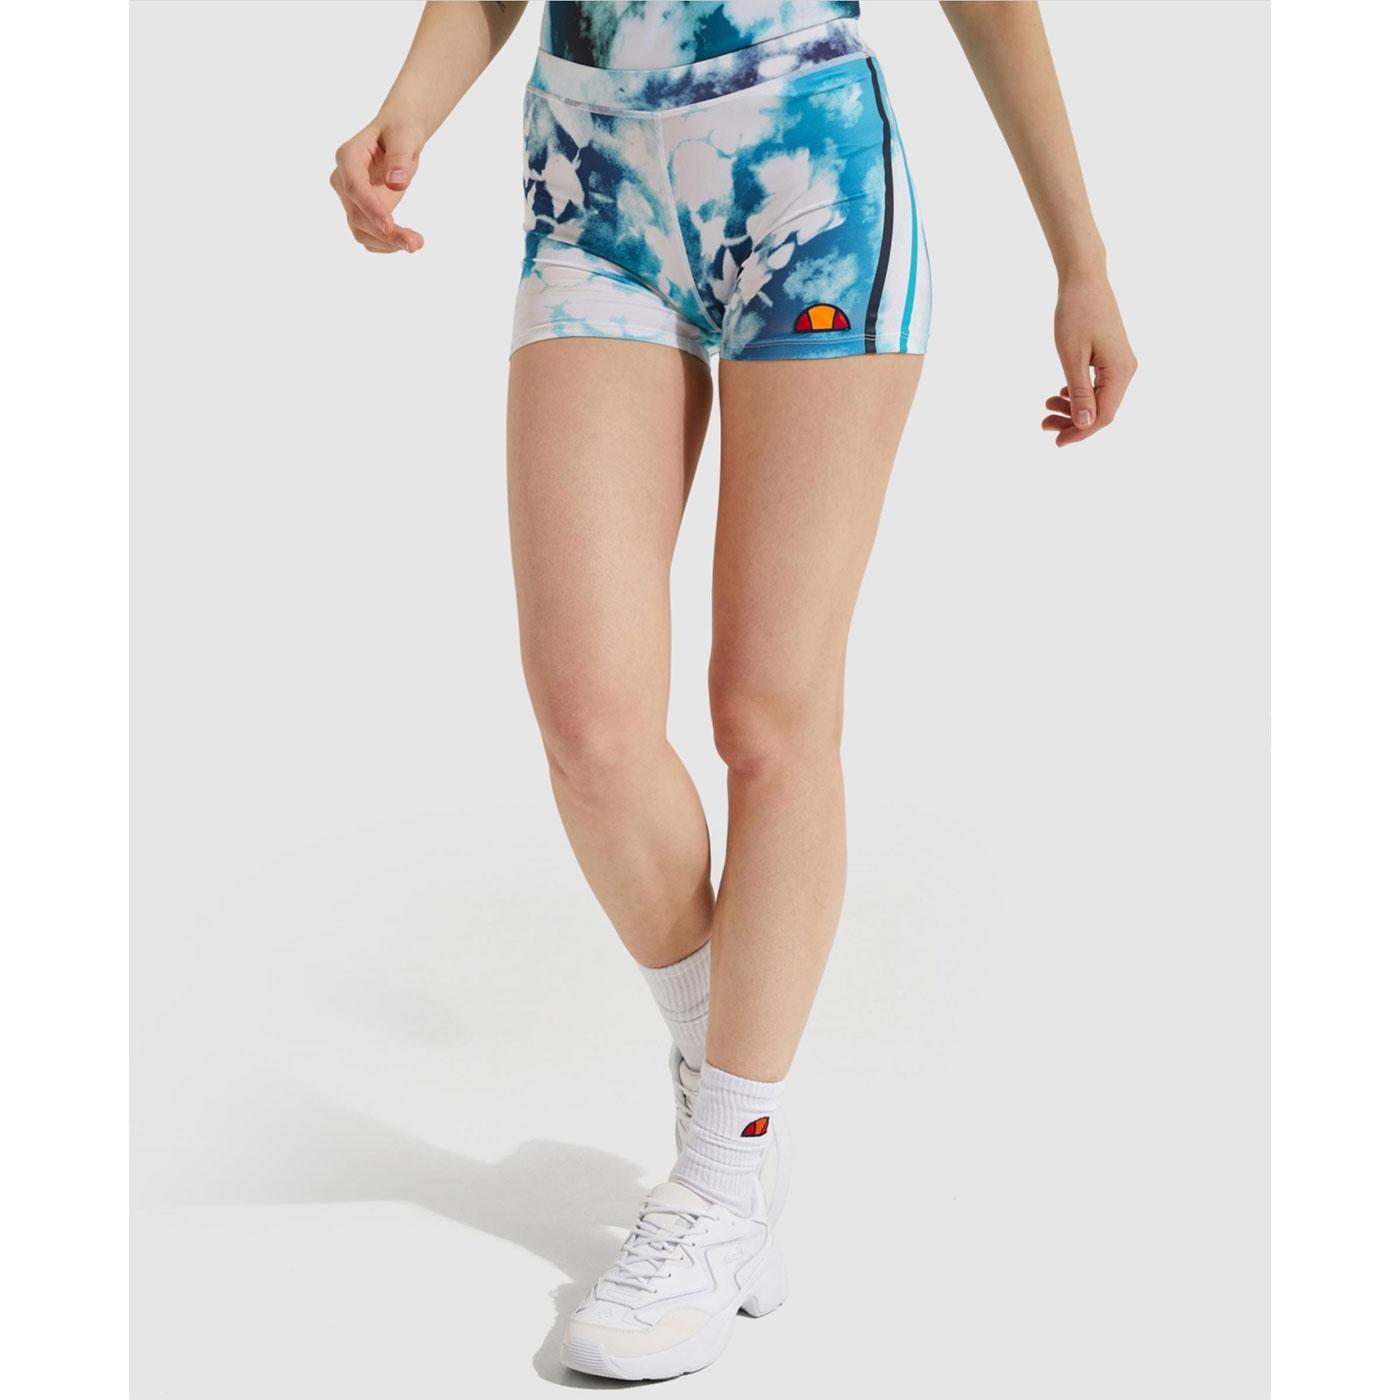 Impeto ELLESSE Women's Retro All Over Print Shorts